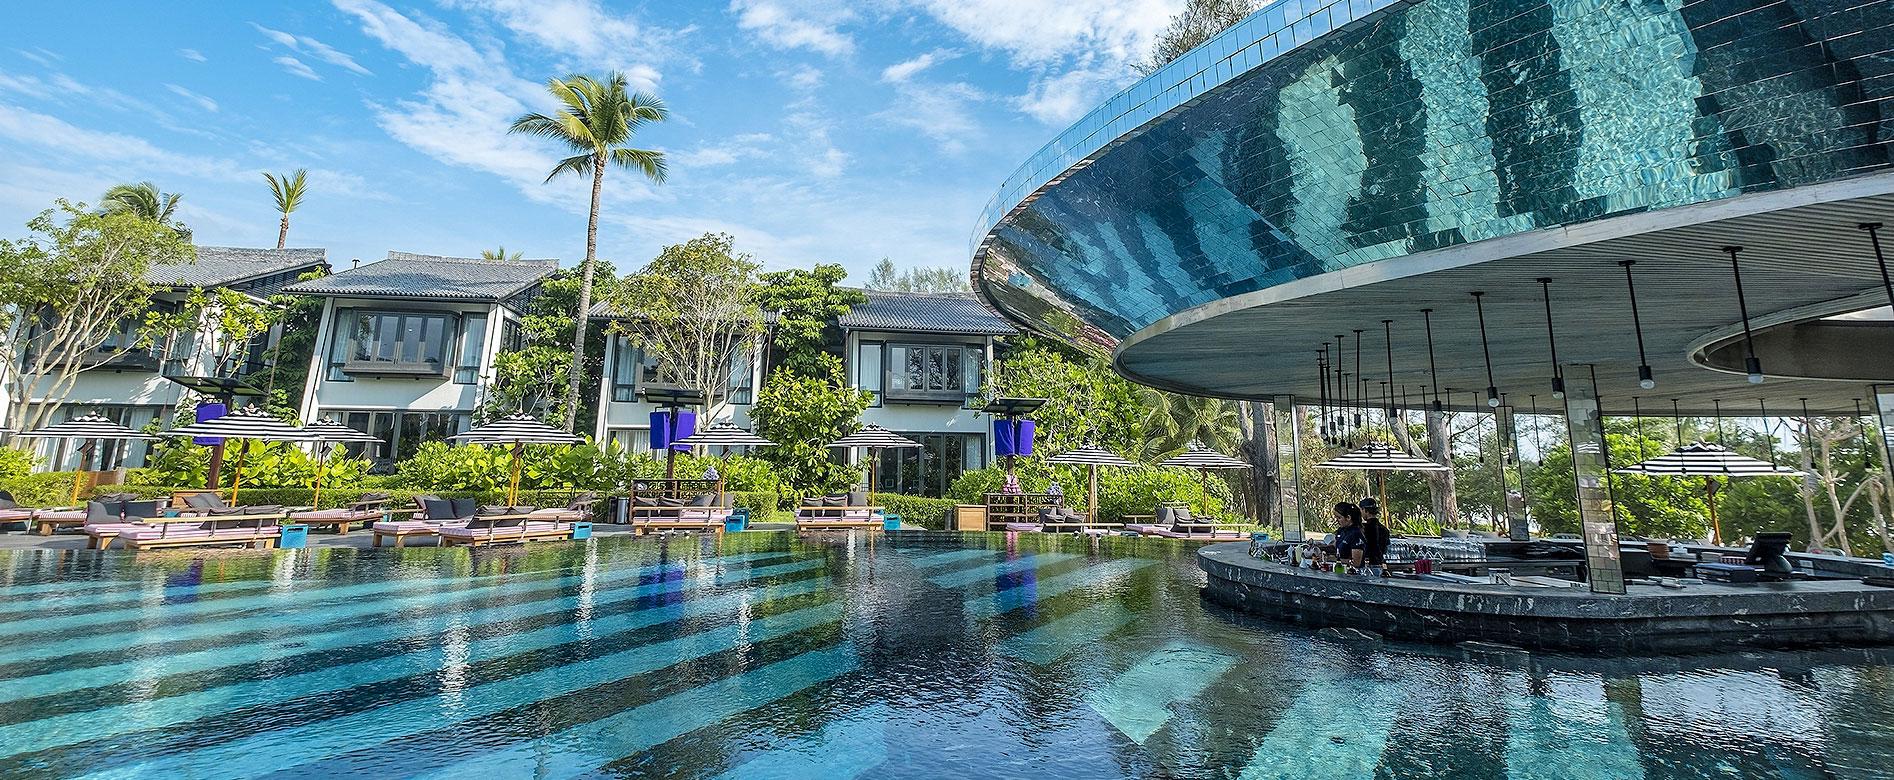 9-Facilities-Baba-Beach-Club-Luxury-Hotel-Phuket-by-Sri-Panwa